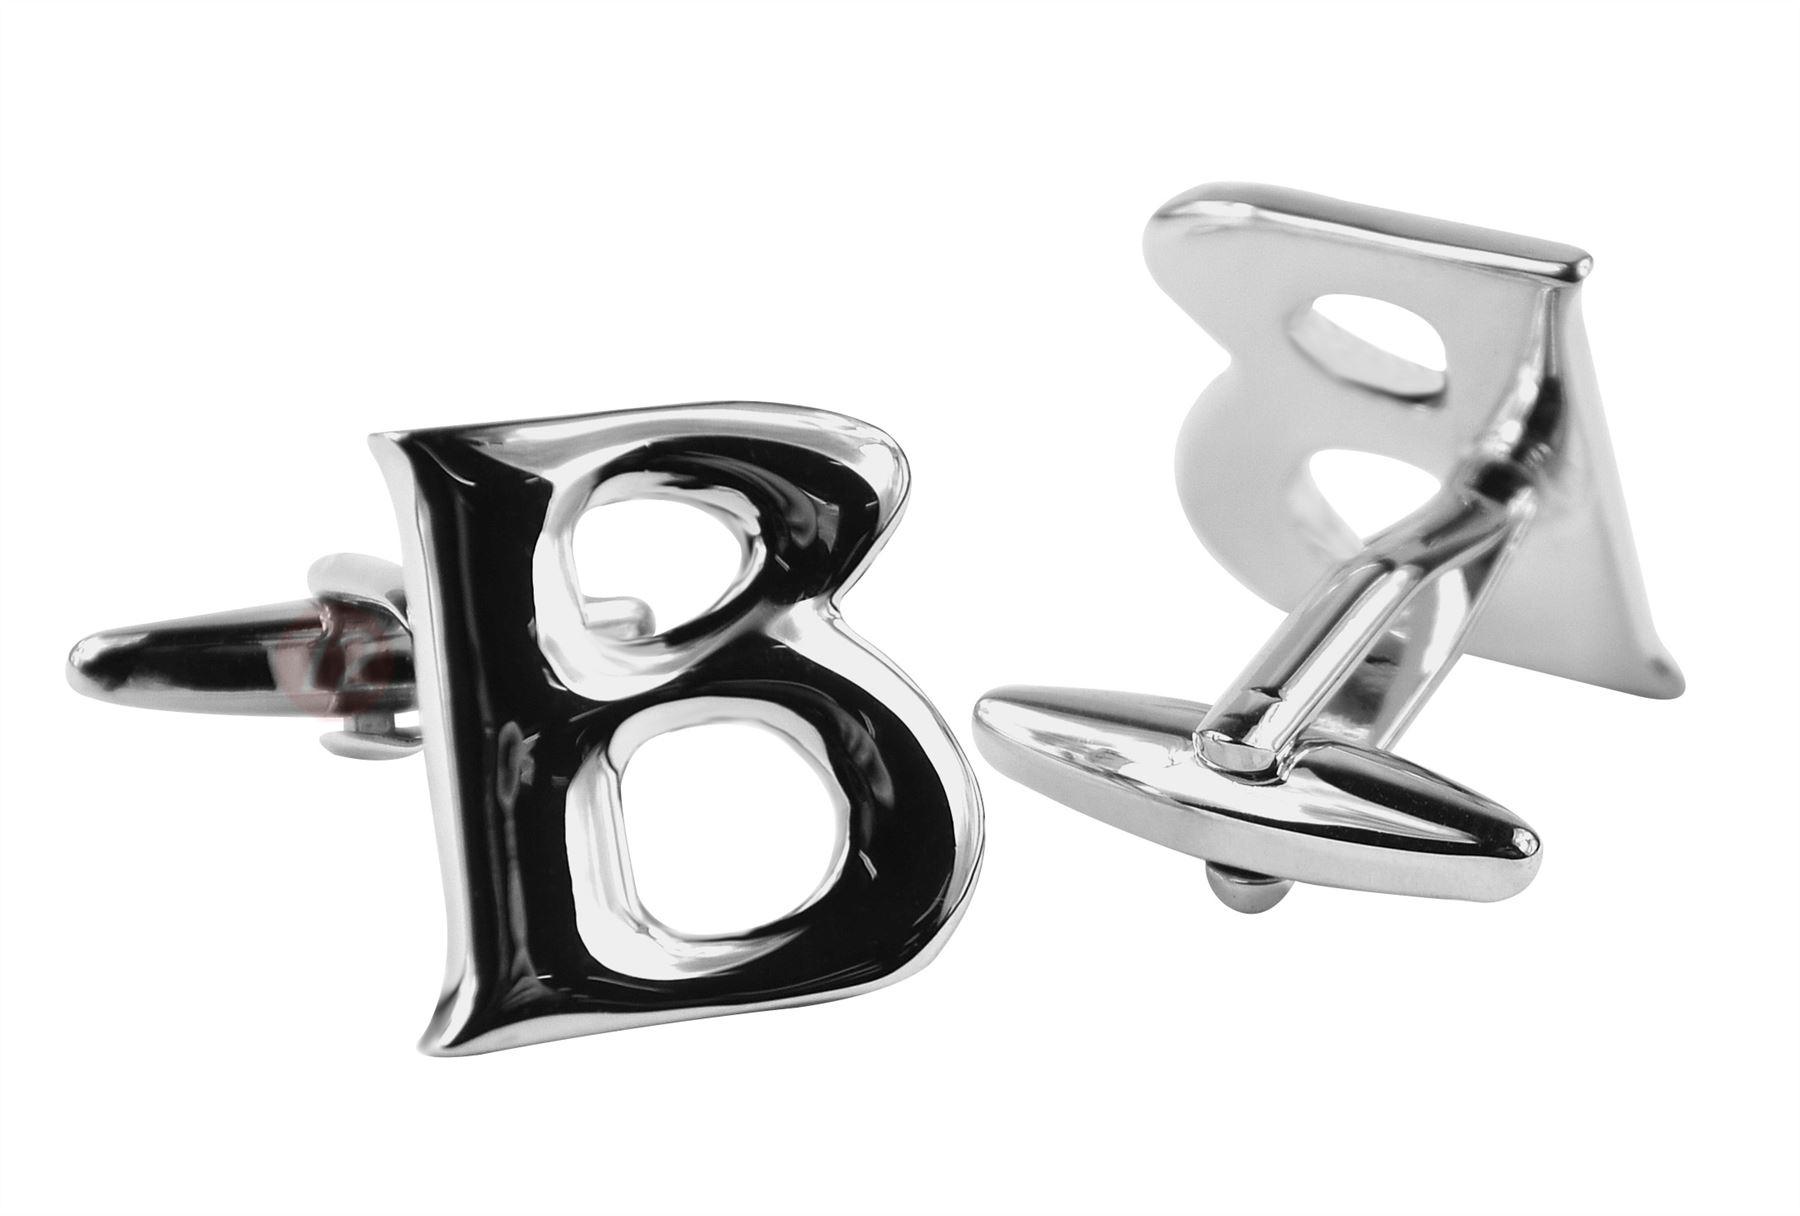 Moda Di Raza Mens Personalized Initial Cufflinks Polished Metal - Silver-B